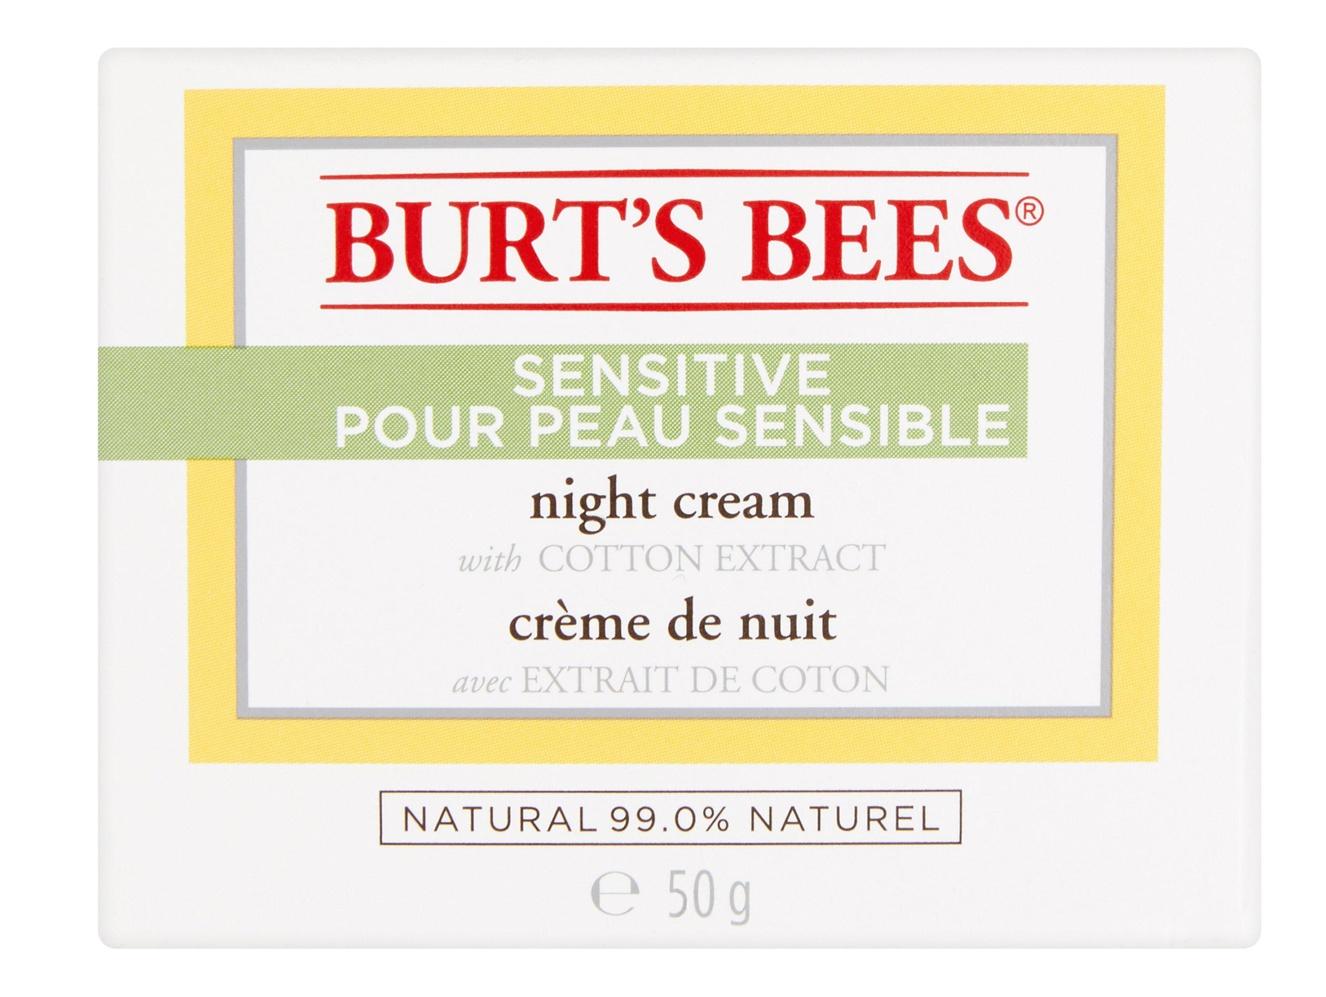 Burt's Bees Sensitive Night Cream